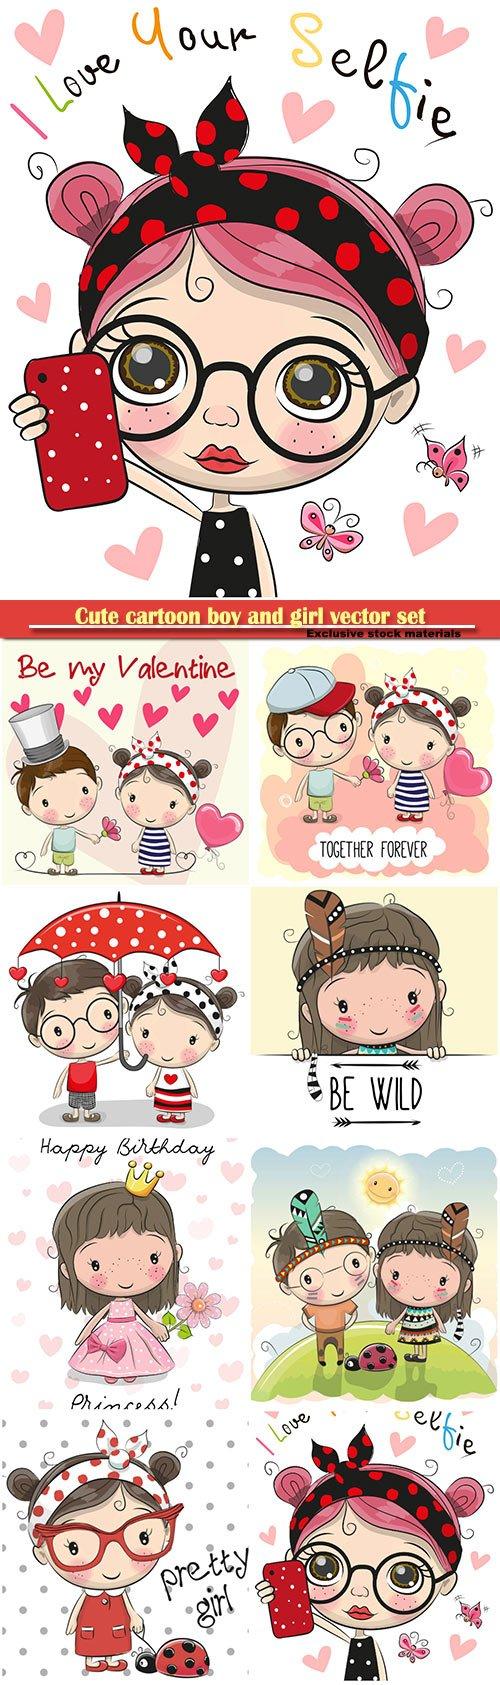 Cute cartoon boy and girl vector set